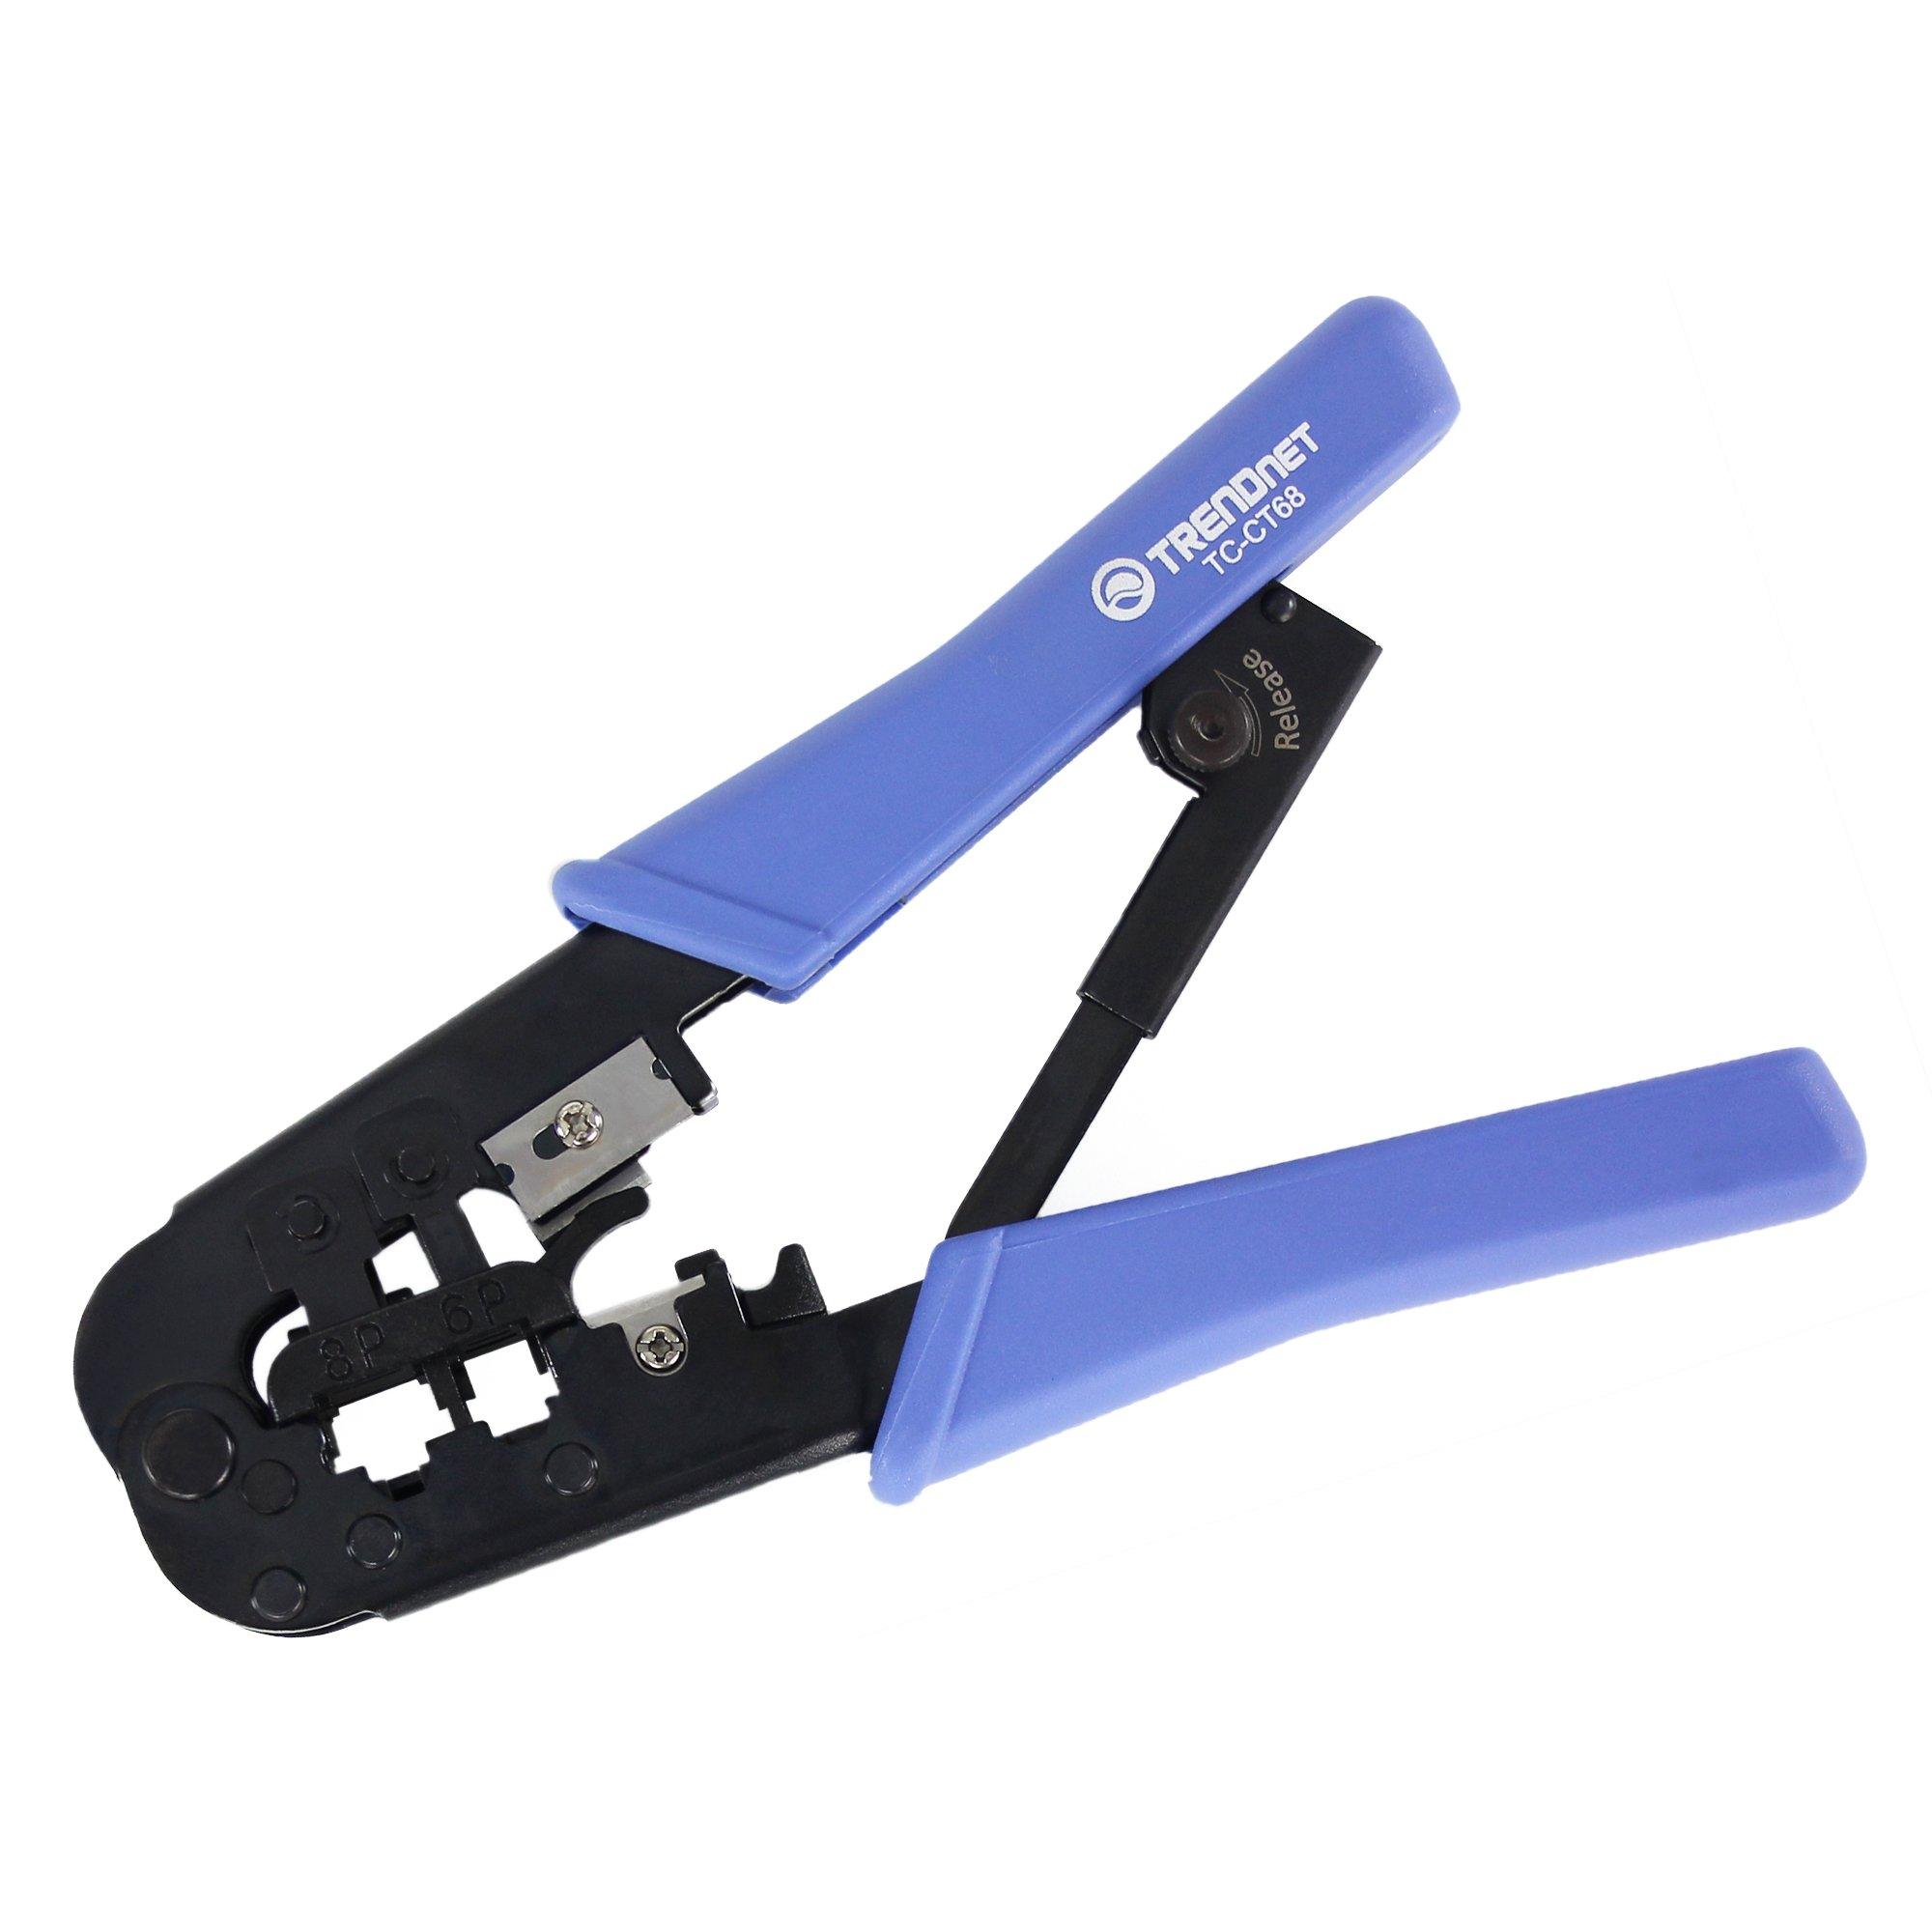 TRENDnet Crimping Tool, 8P/Rj-45 & 6P/Rj-12, Rj-11 Crimp, Cut, & Strip Tool, TC-CT68 by TRENDnet